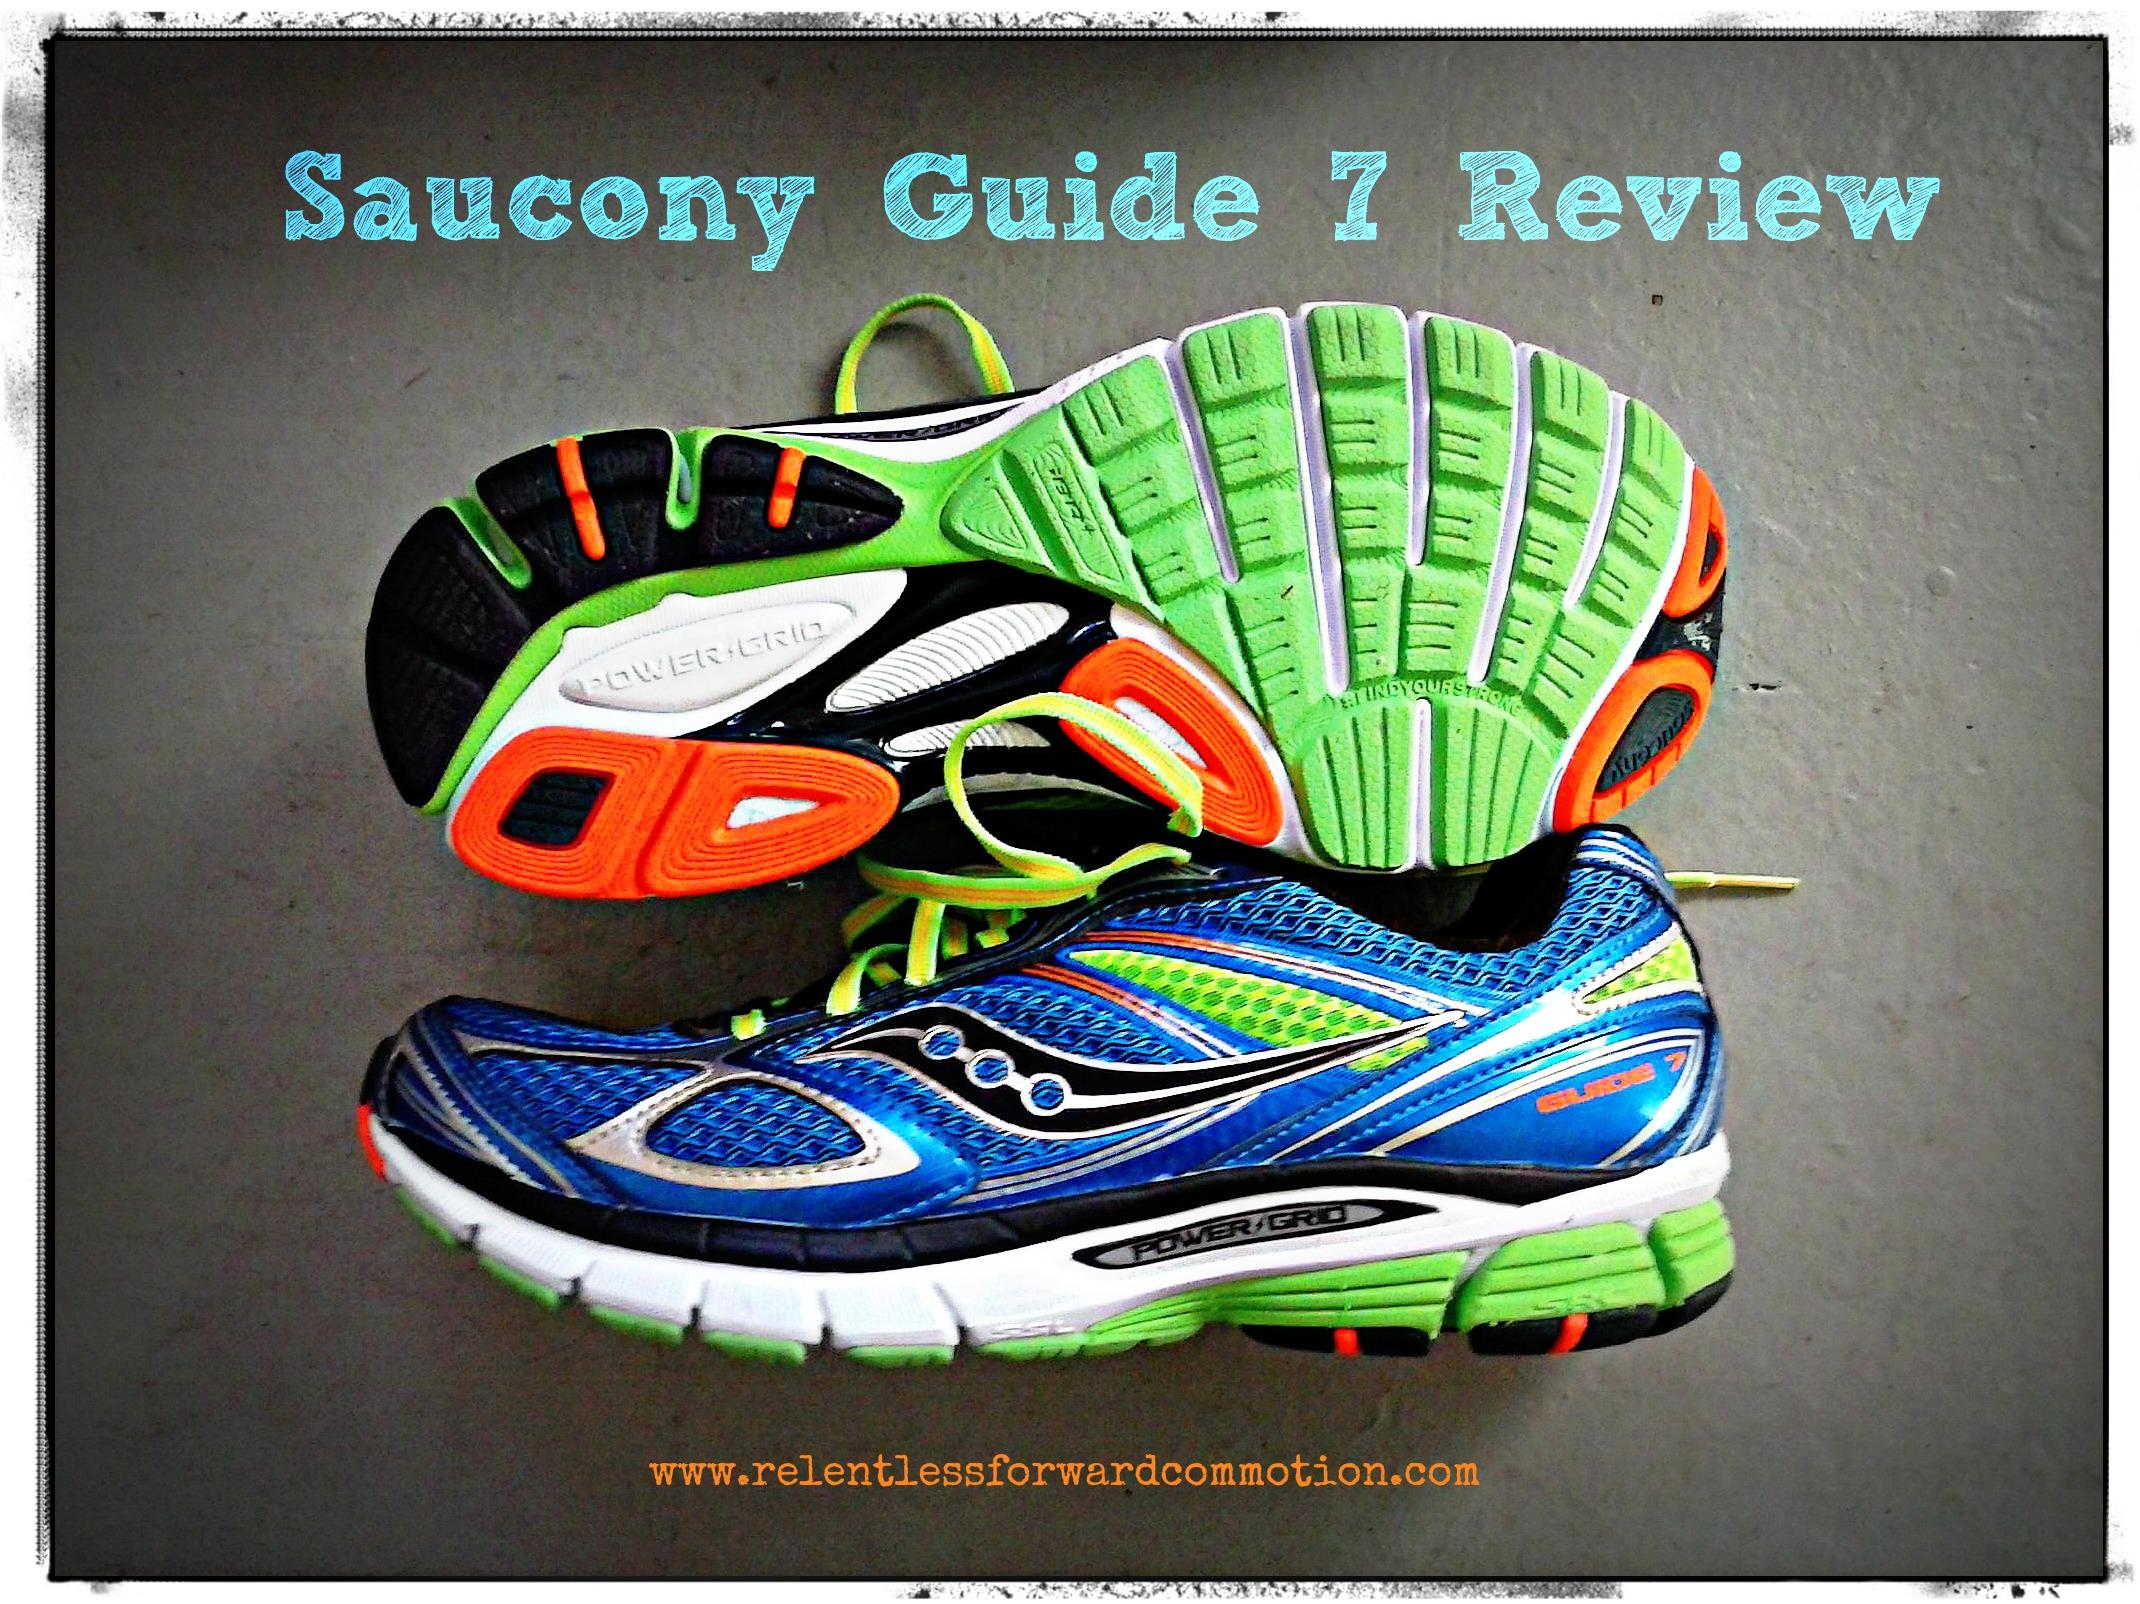 Saucony Guide 7